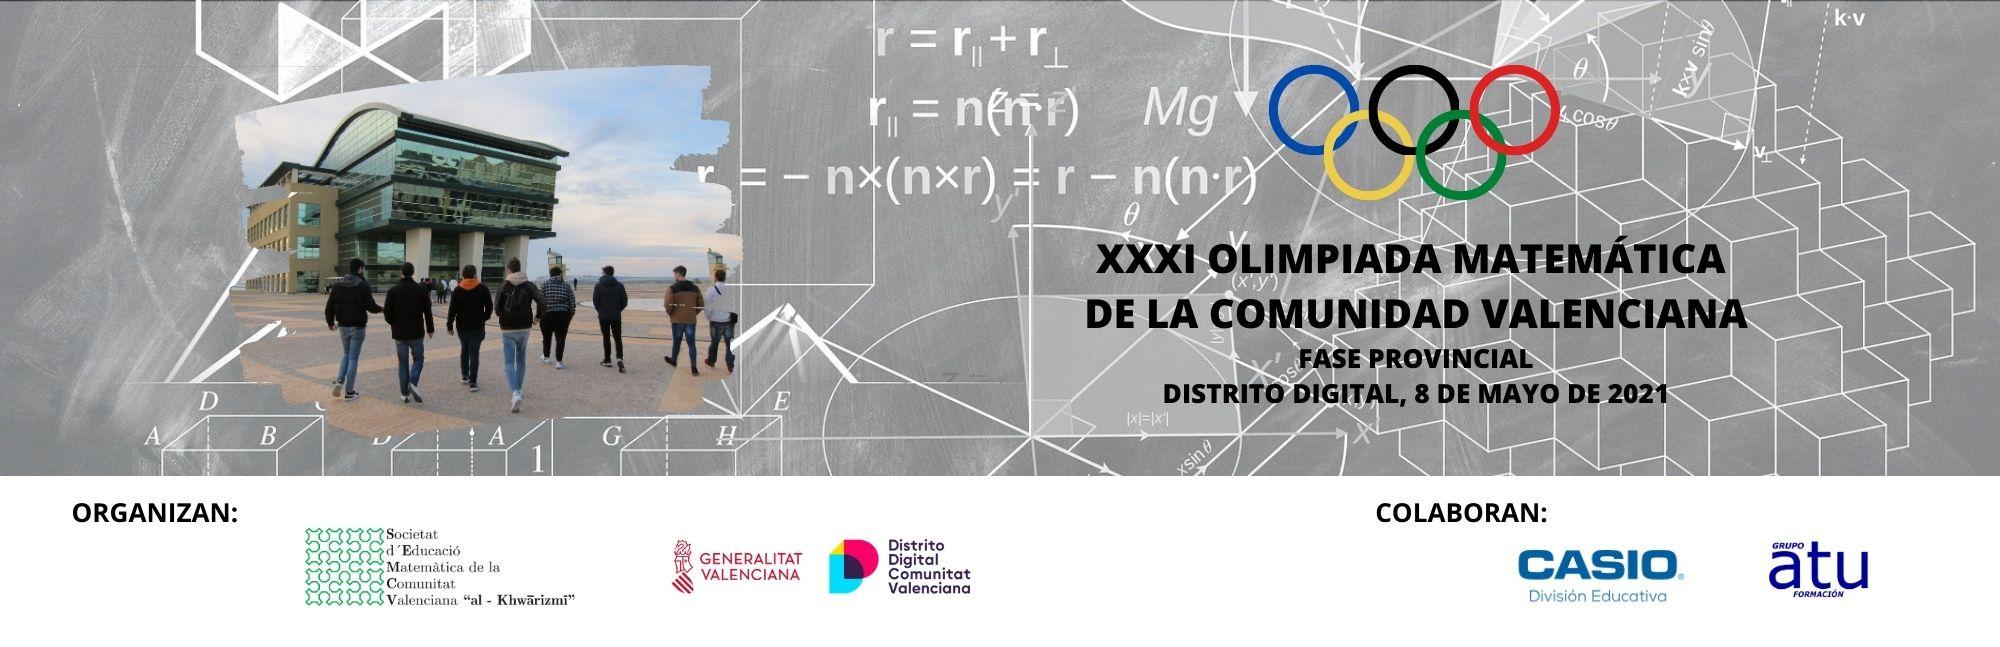 Olimpiada Matemática 2021